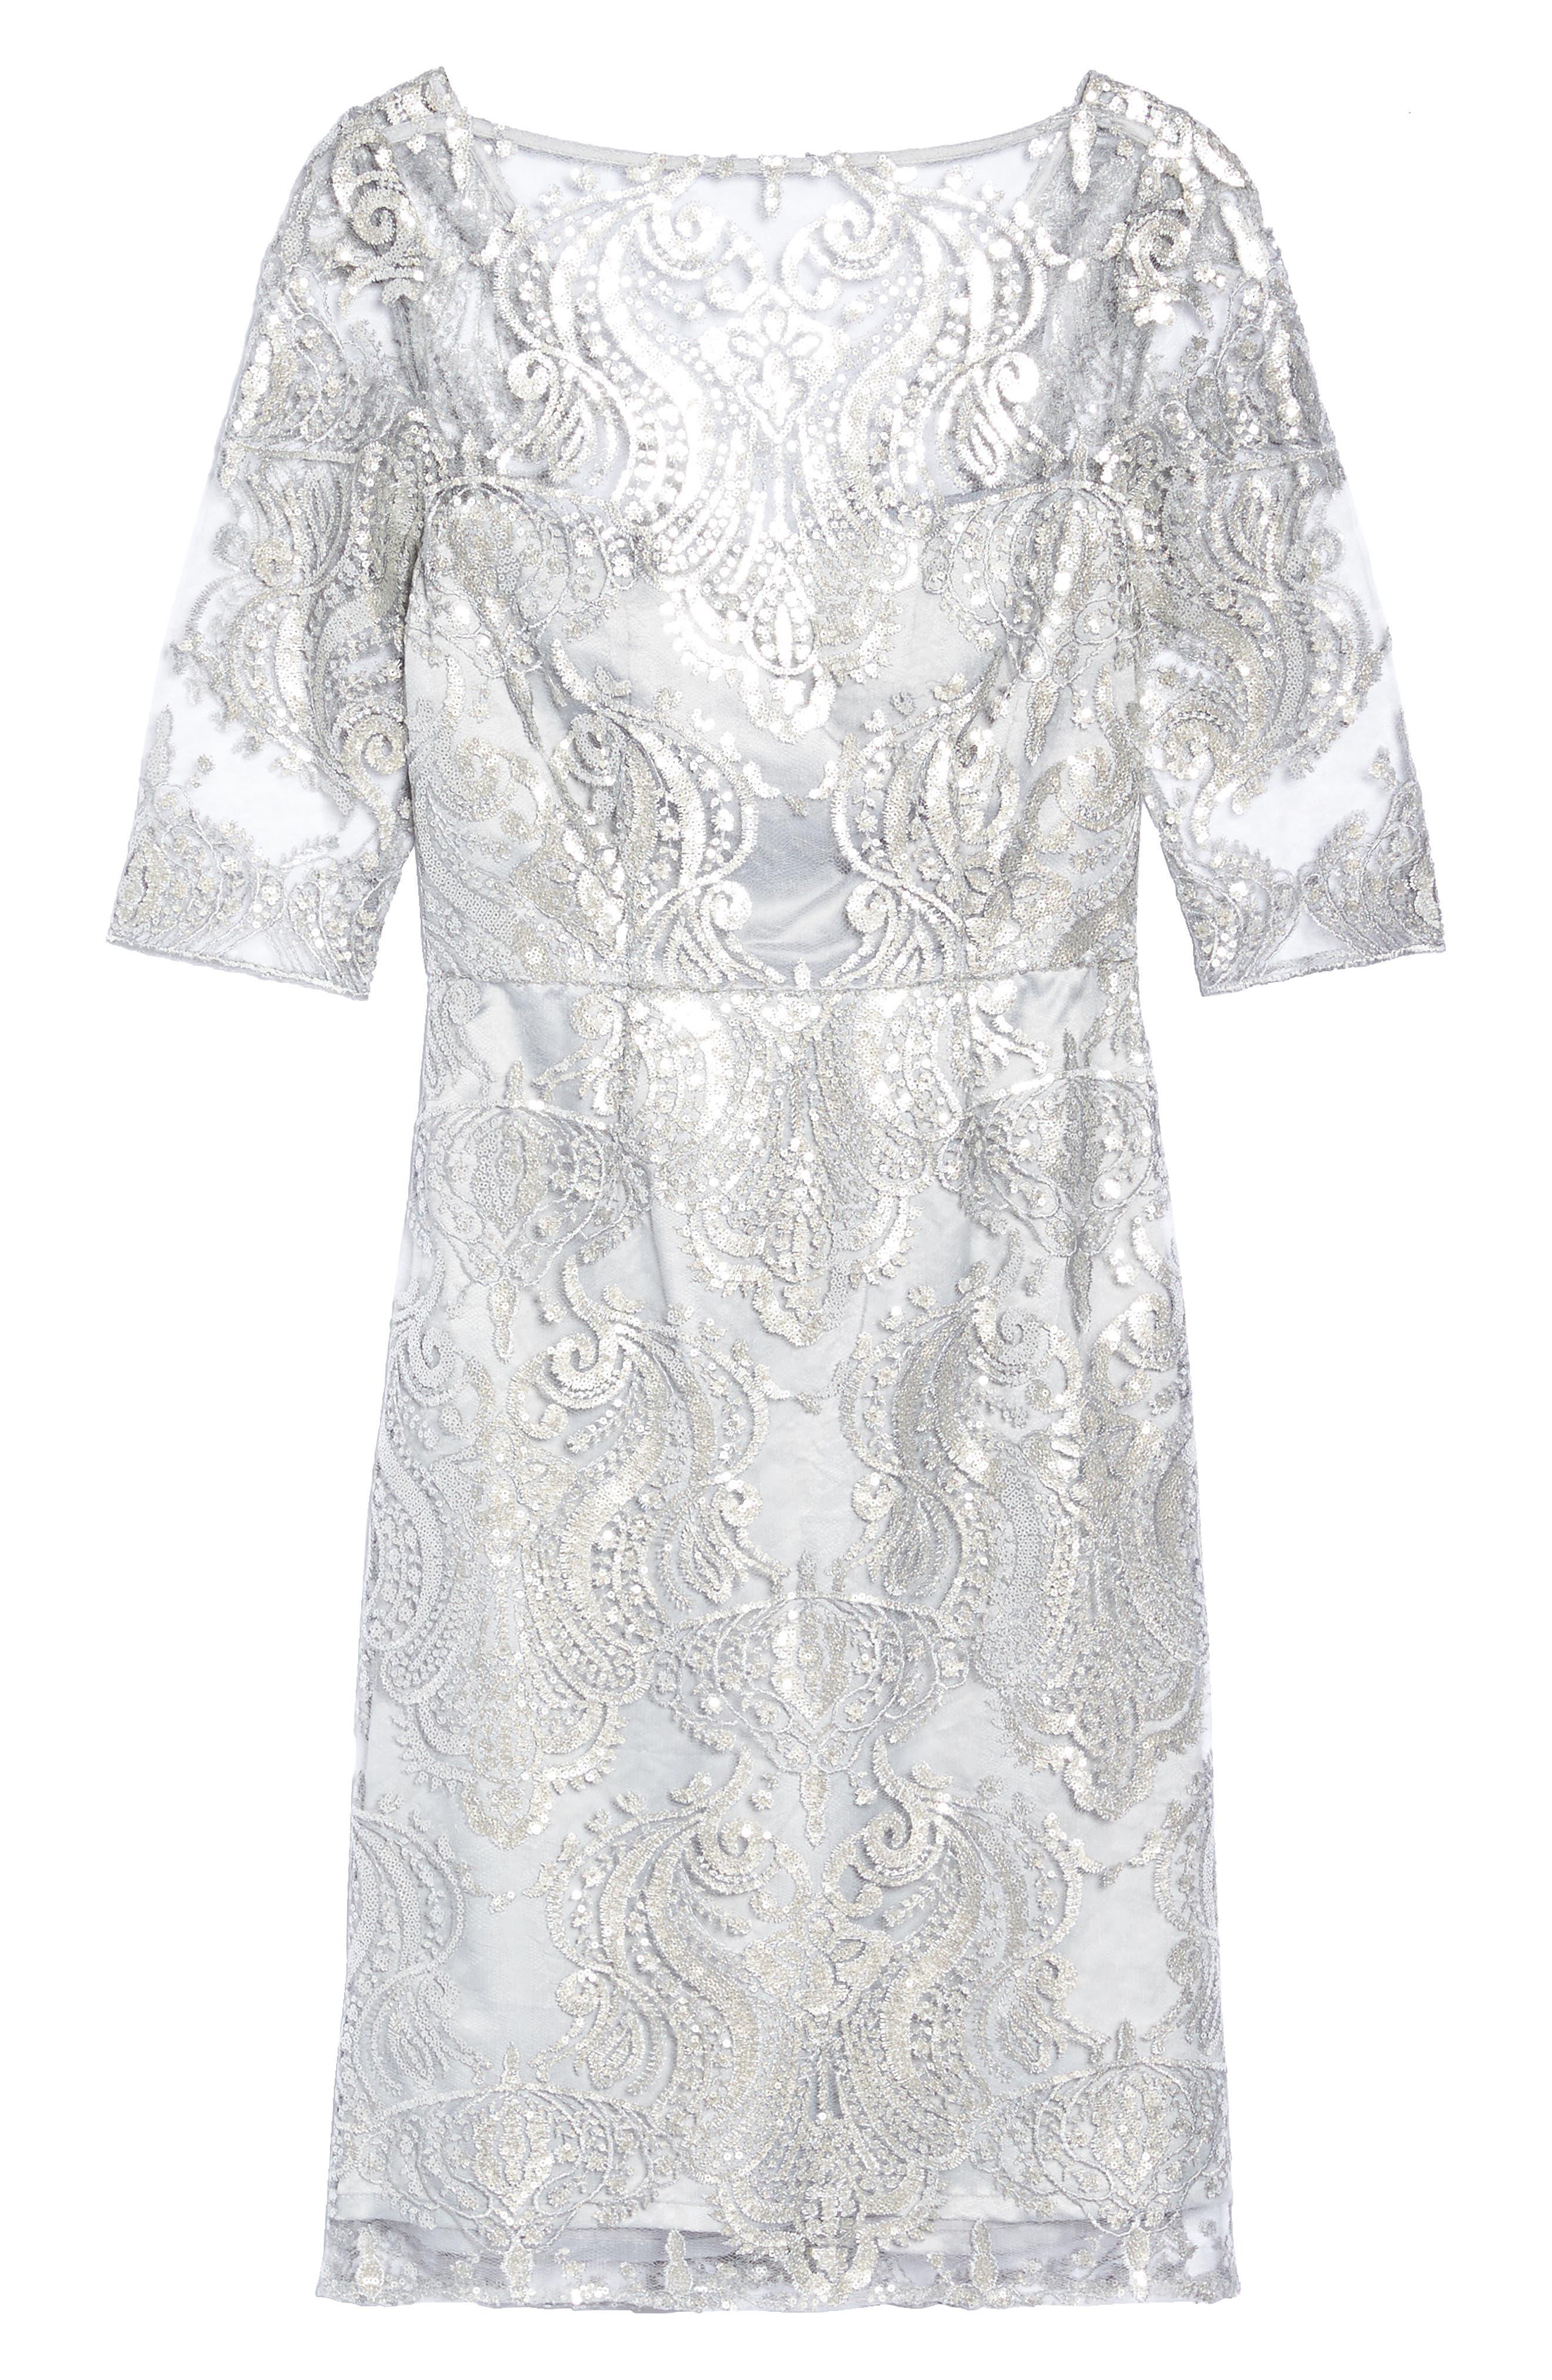 Sequin Illusion Sheath Dress,                             Alternate thumbnail 8, color,